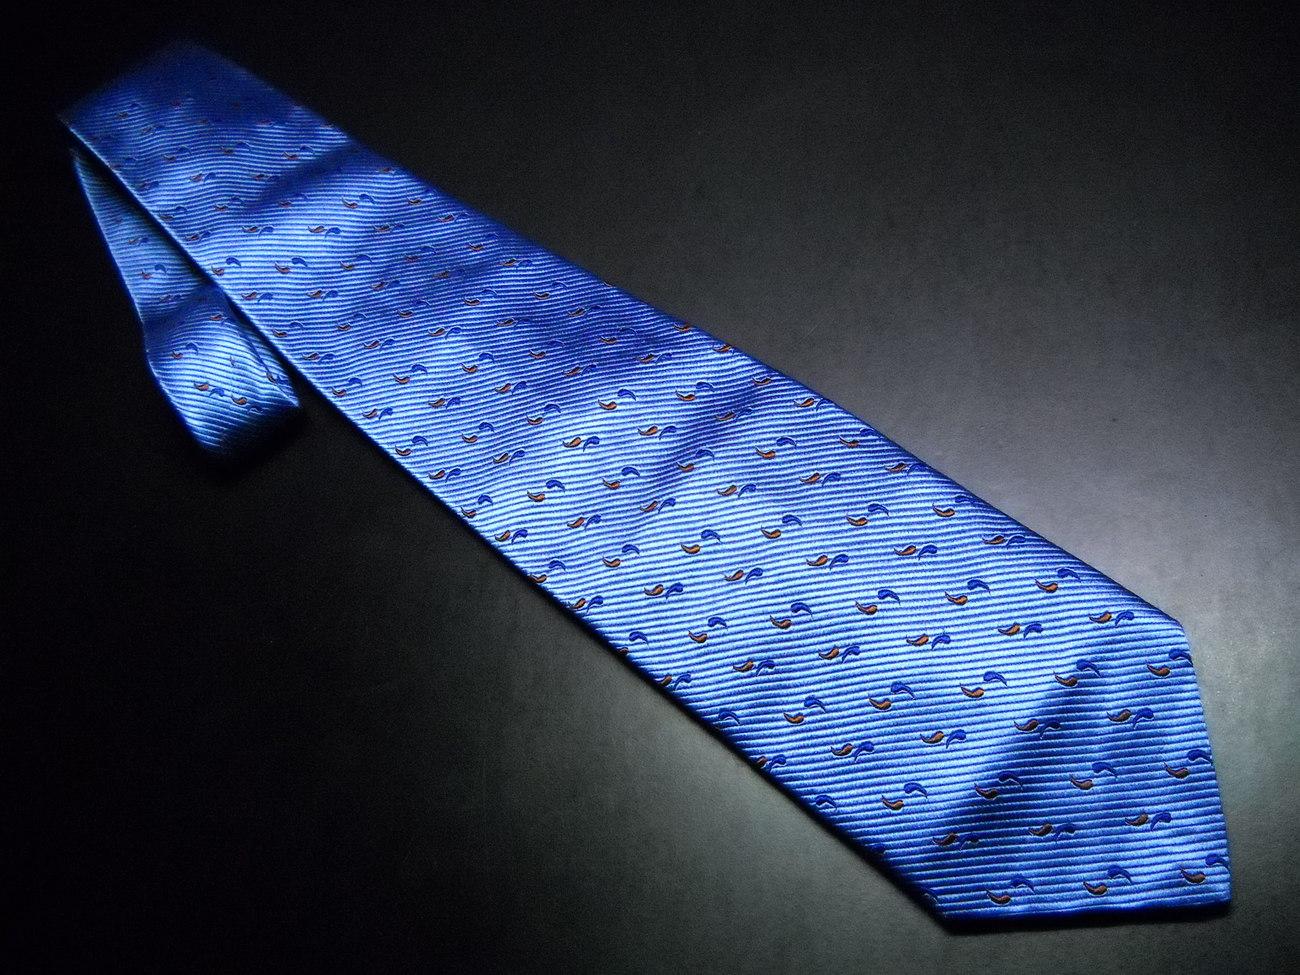 Tie f.r. tripler   co diagional stripes of blues 01